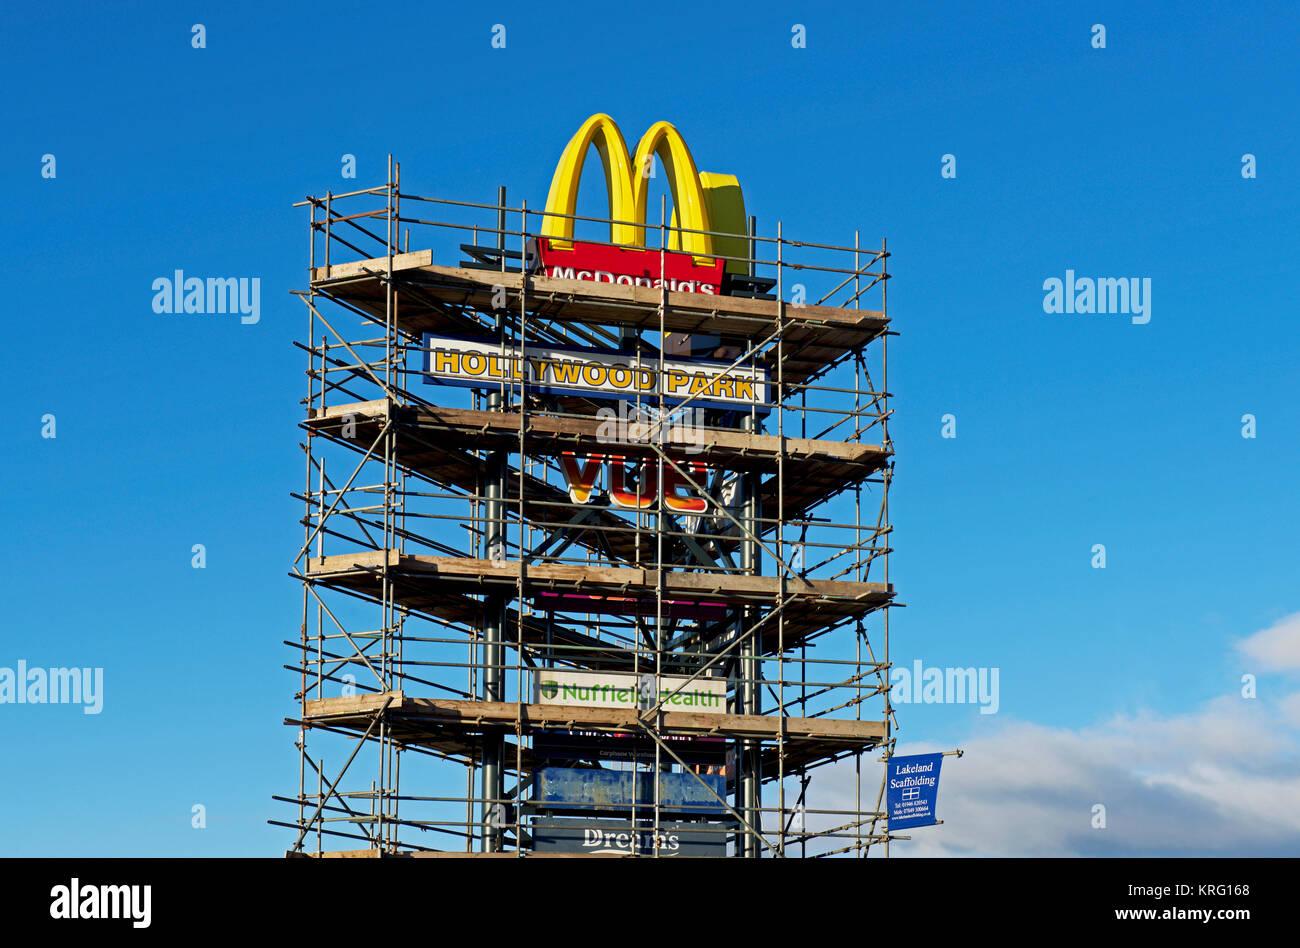 McDonalds Logo und Gerüstbau, England Großbritannien Stockbild